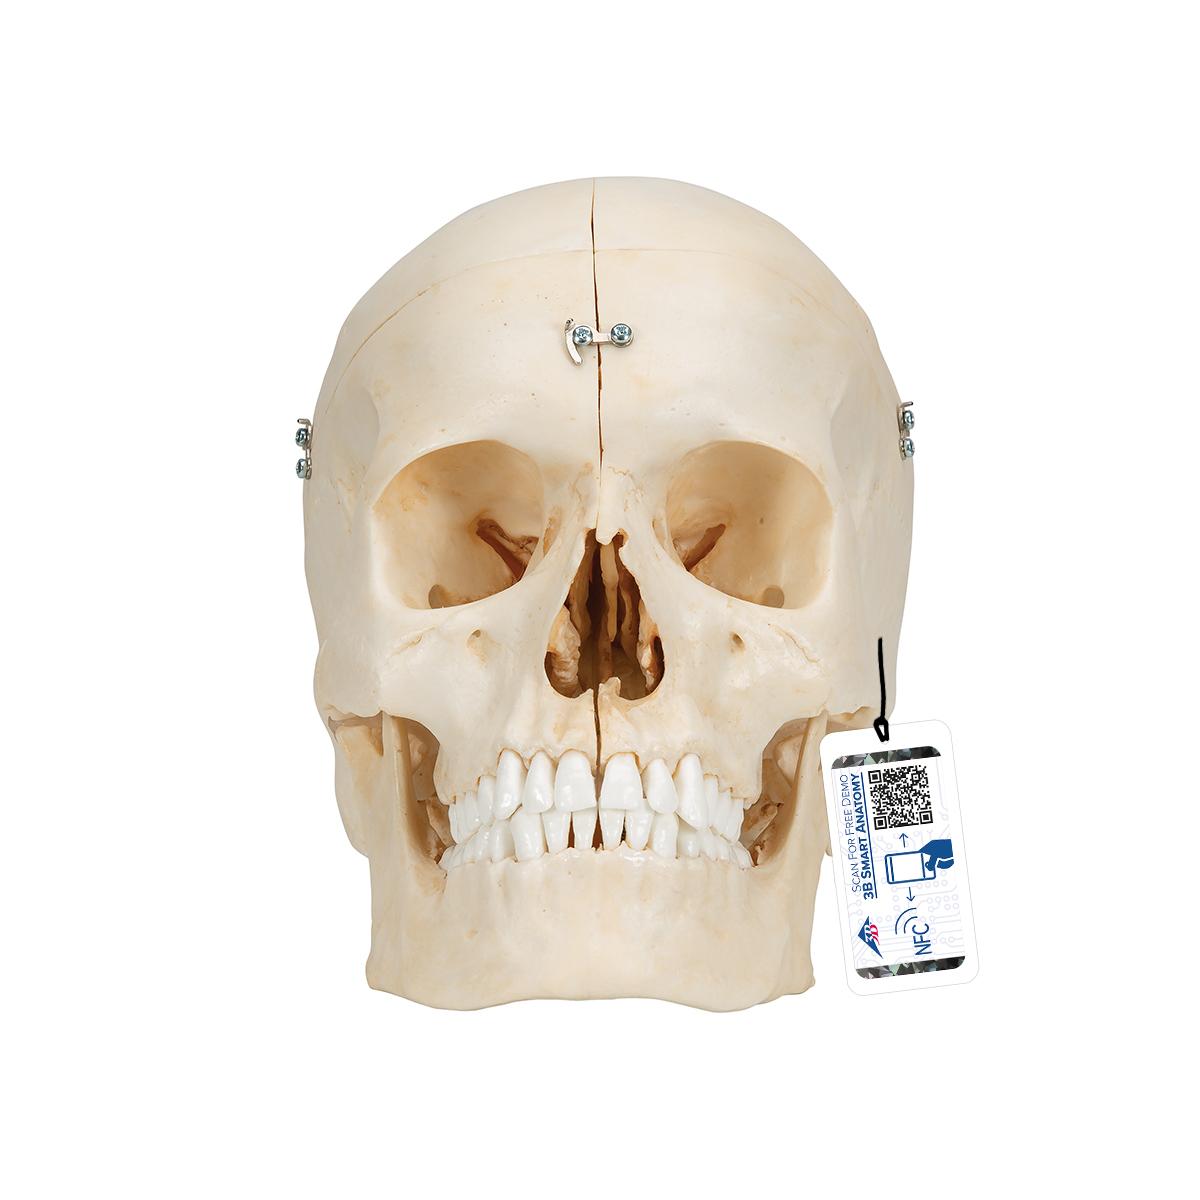 Human Skull Model Plastic Skull Model Realistic Bonelike Human Skull